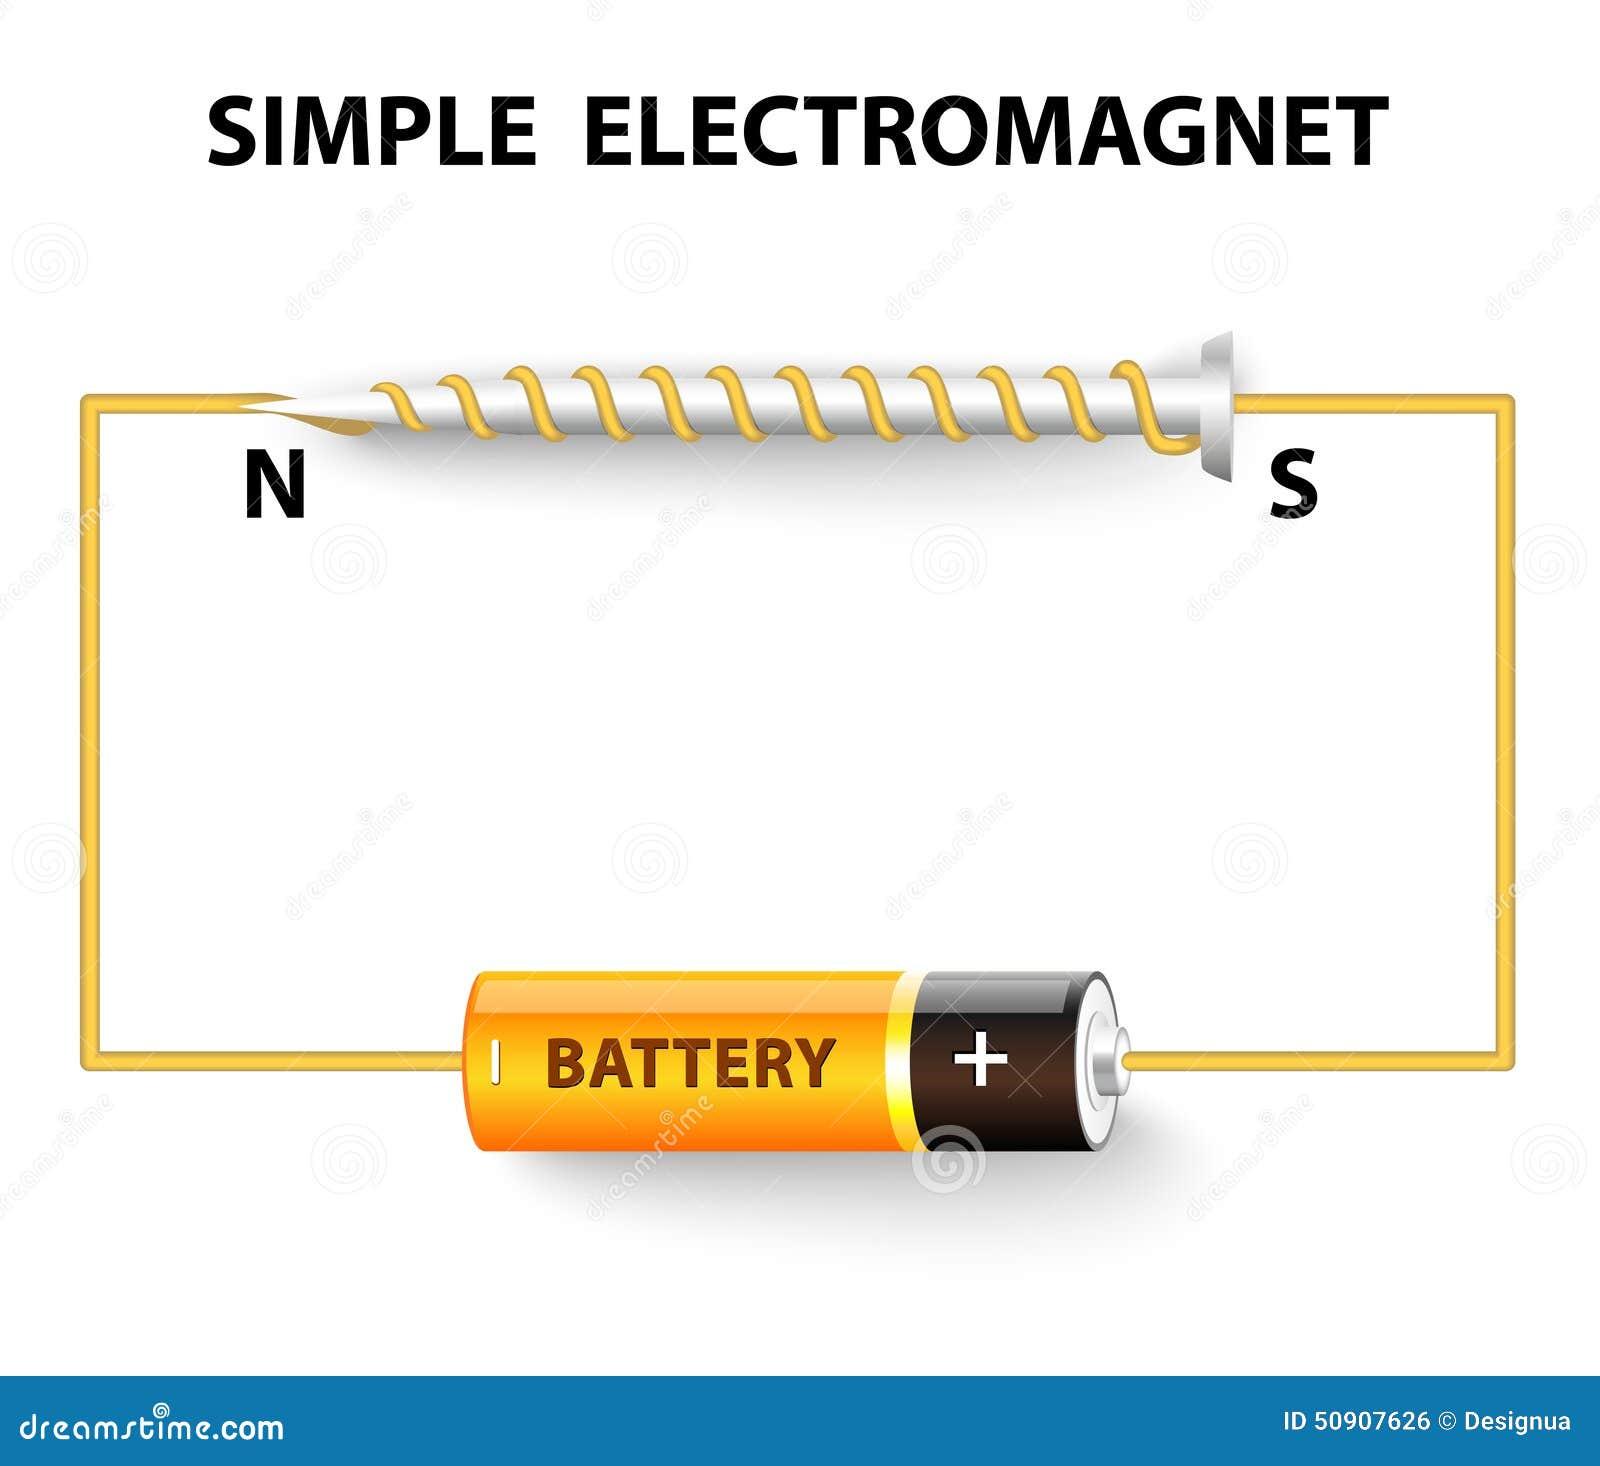 Mazda Mx5 Mk2 Wiring Diagram together with RepairGuideContent besides Stock Illustratie Eenvoudige Elektromagneet Image50907626 besides How To Make Solar Battery Charger moreover Alternatore. on circuit diagram of alternator 7